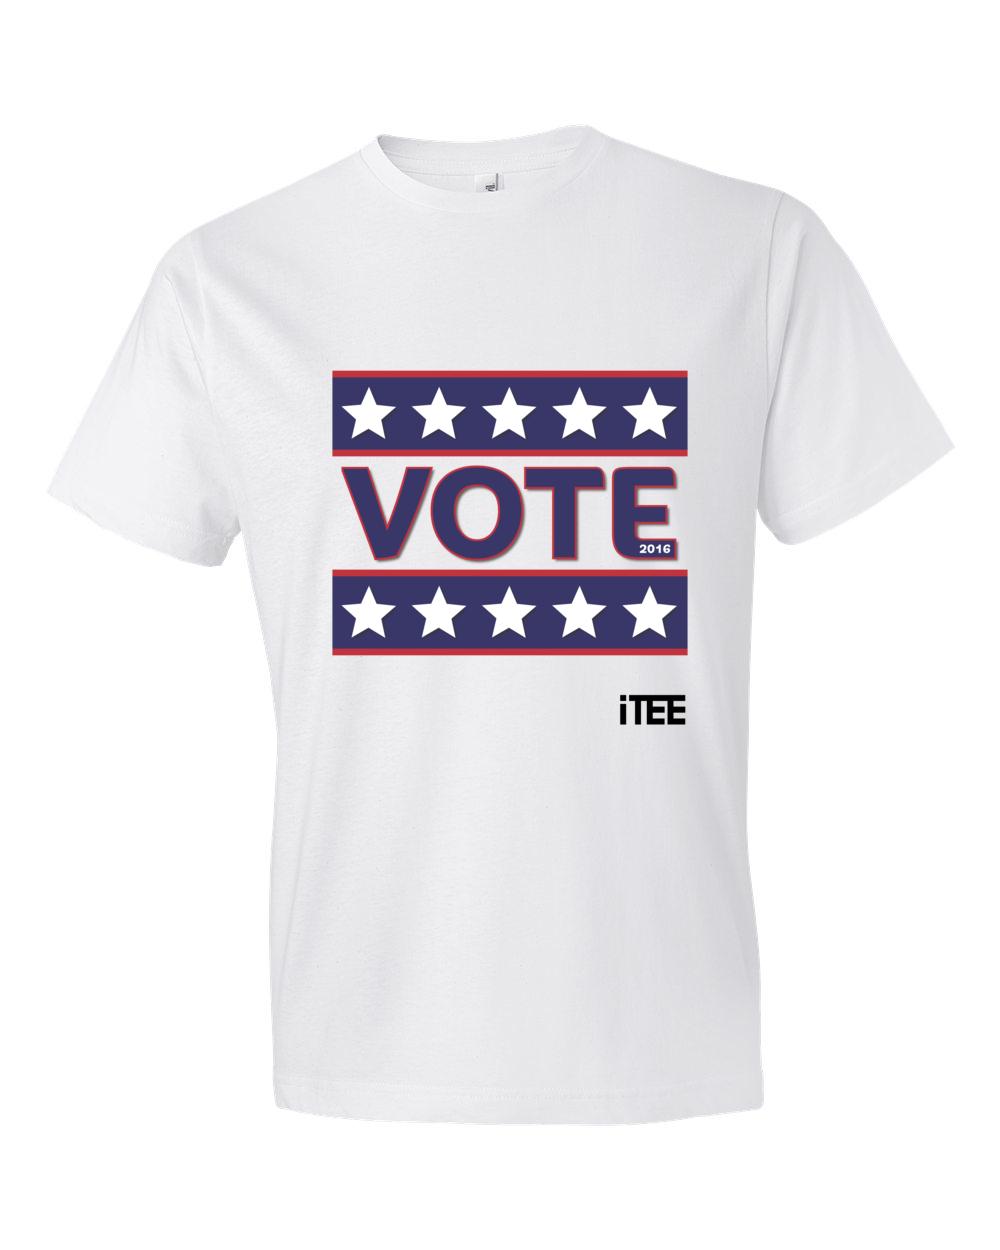 Vote-2016-Lightweight-Fashion-Short-Sleeve-T-Shirt-by-iTEE.com